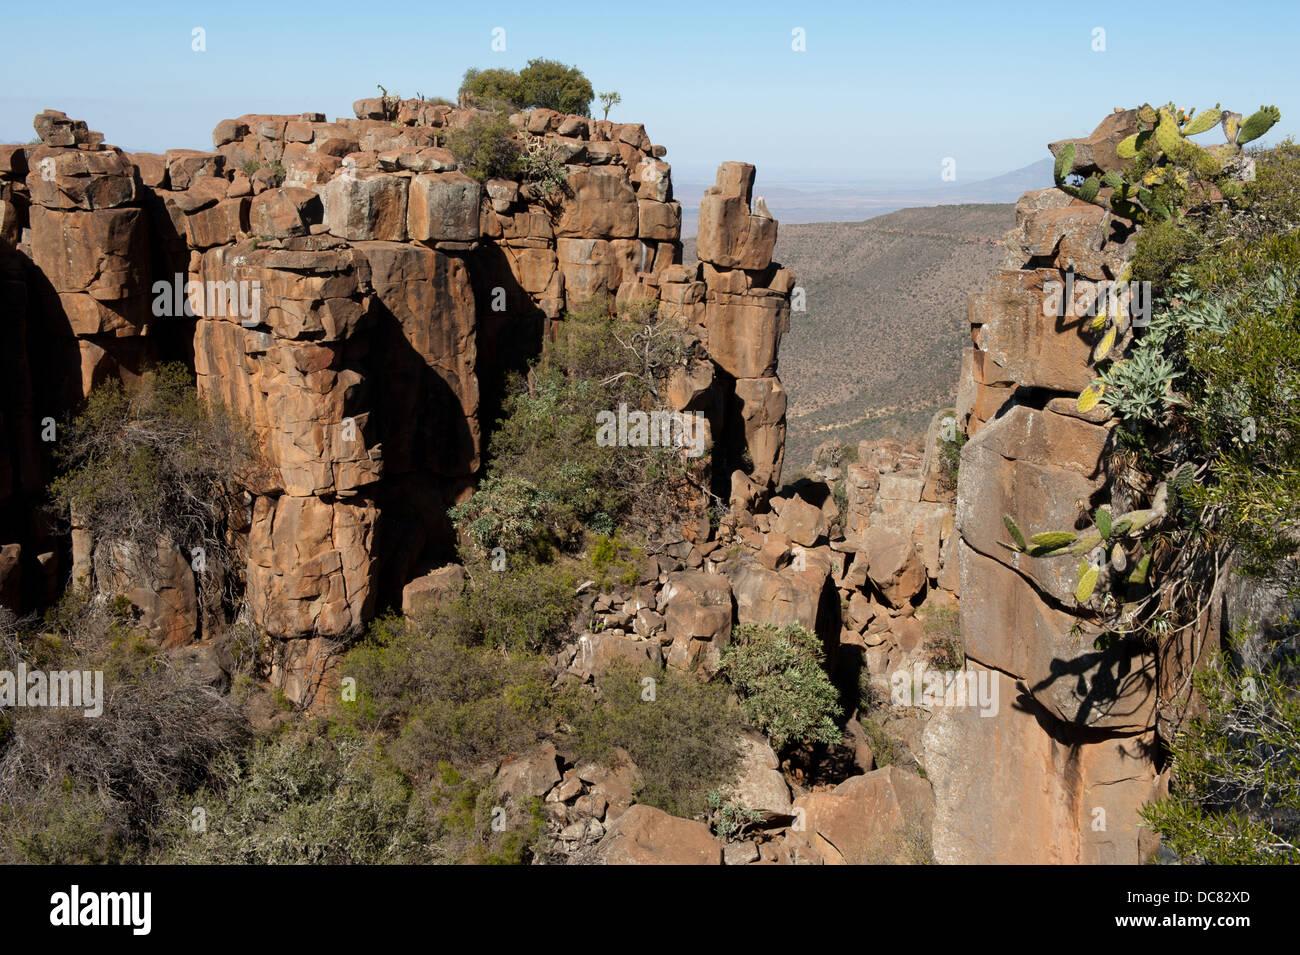 Valley of Desolation, Graaff-Reinet, Camdeboo National Park, South Africa - Stock Image